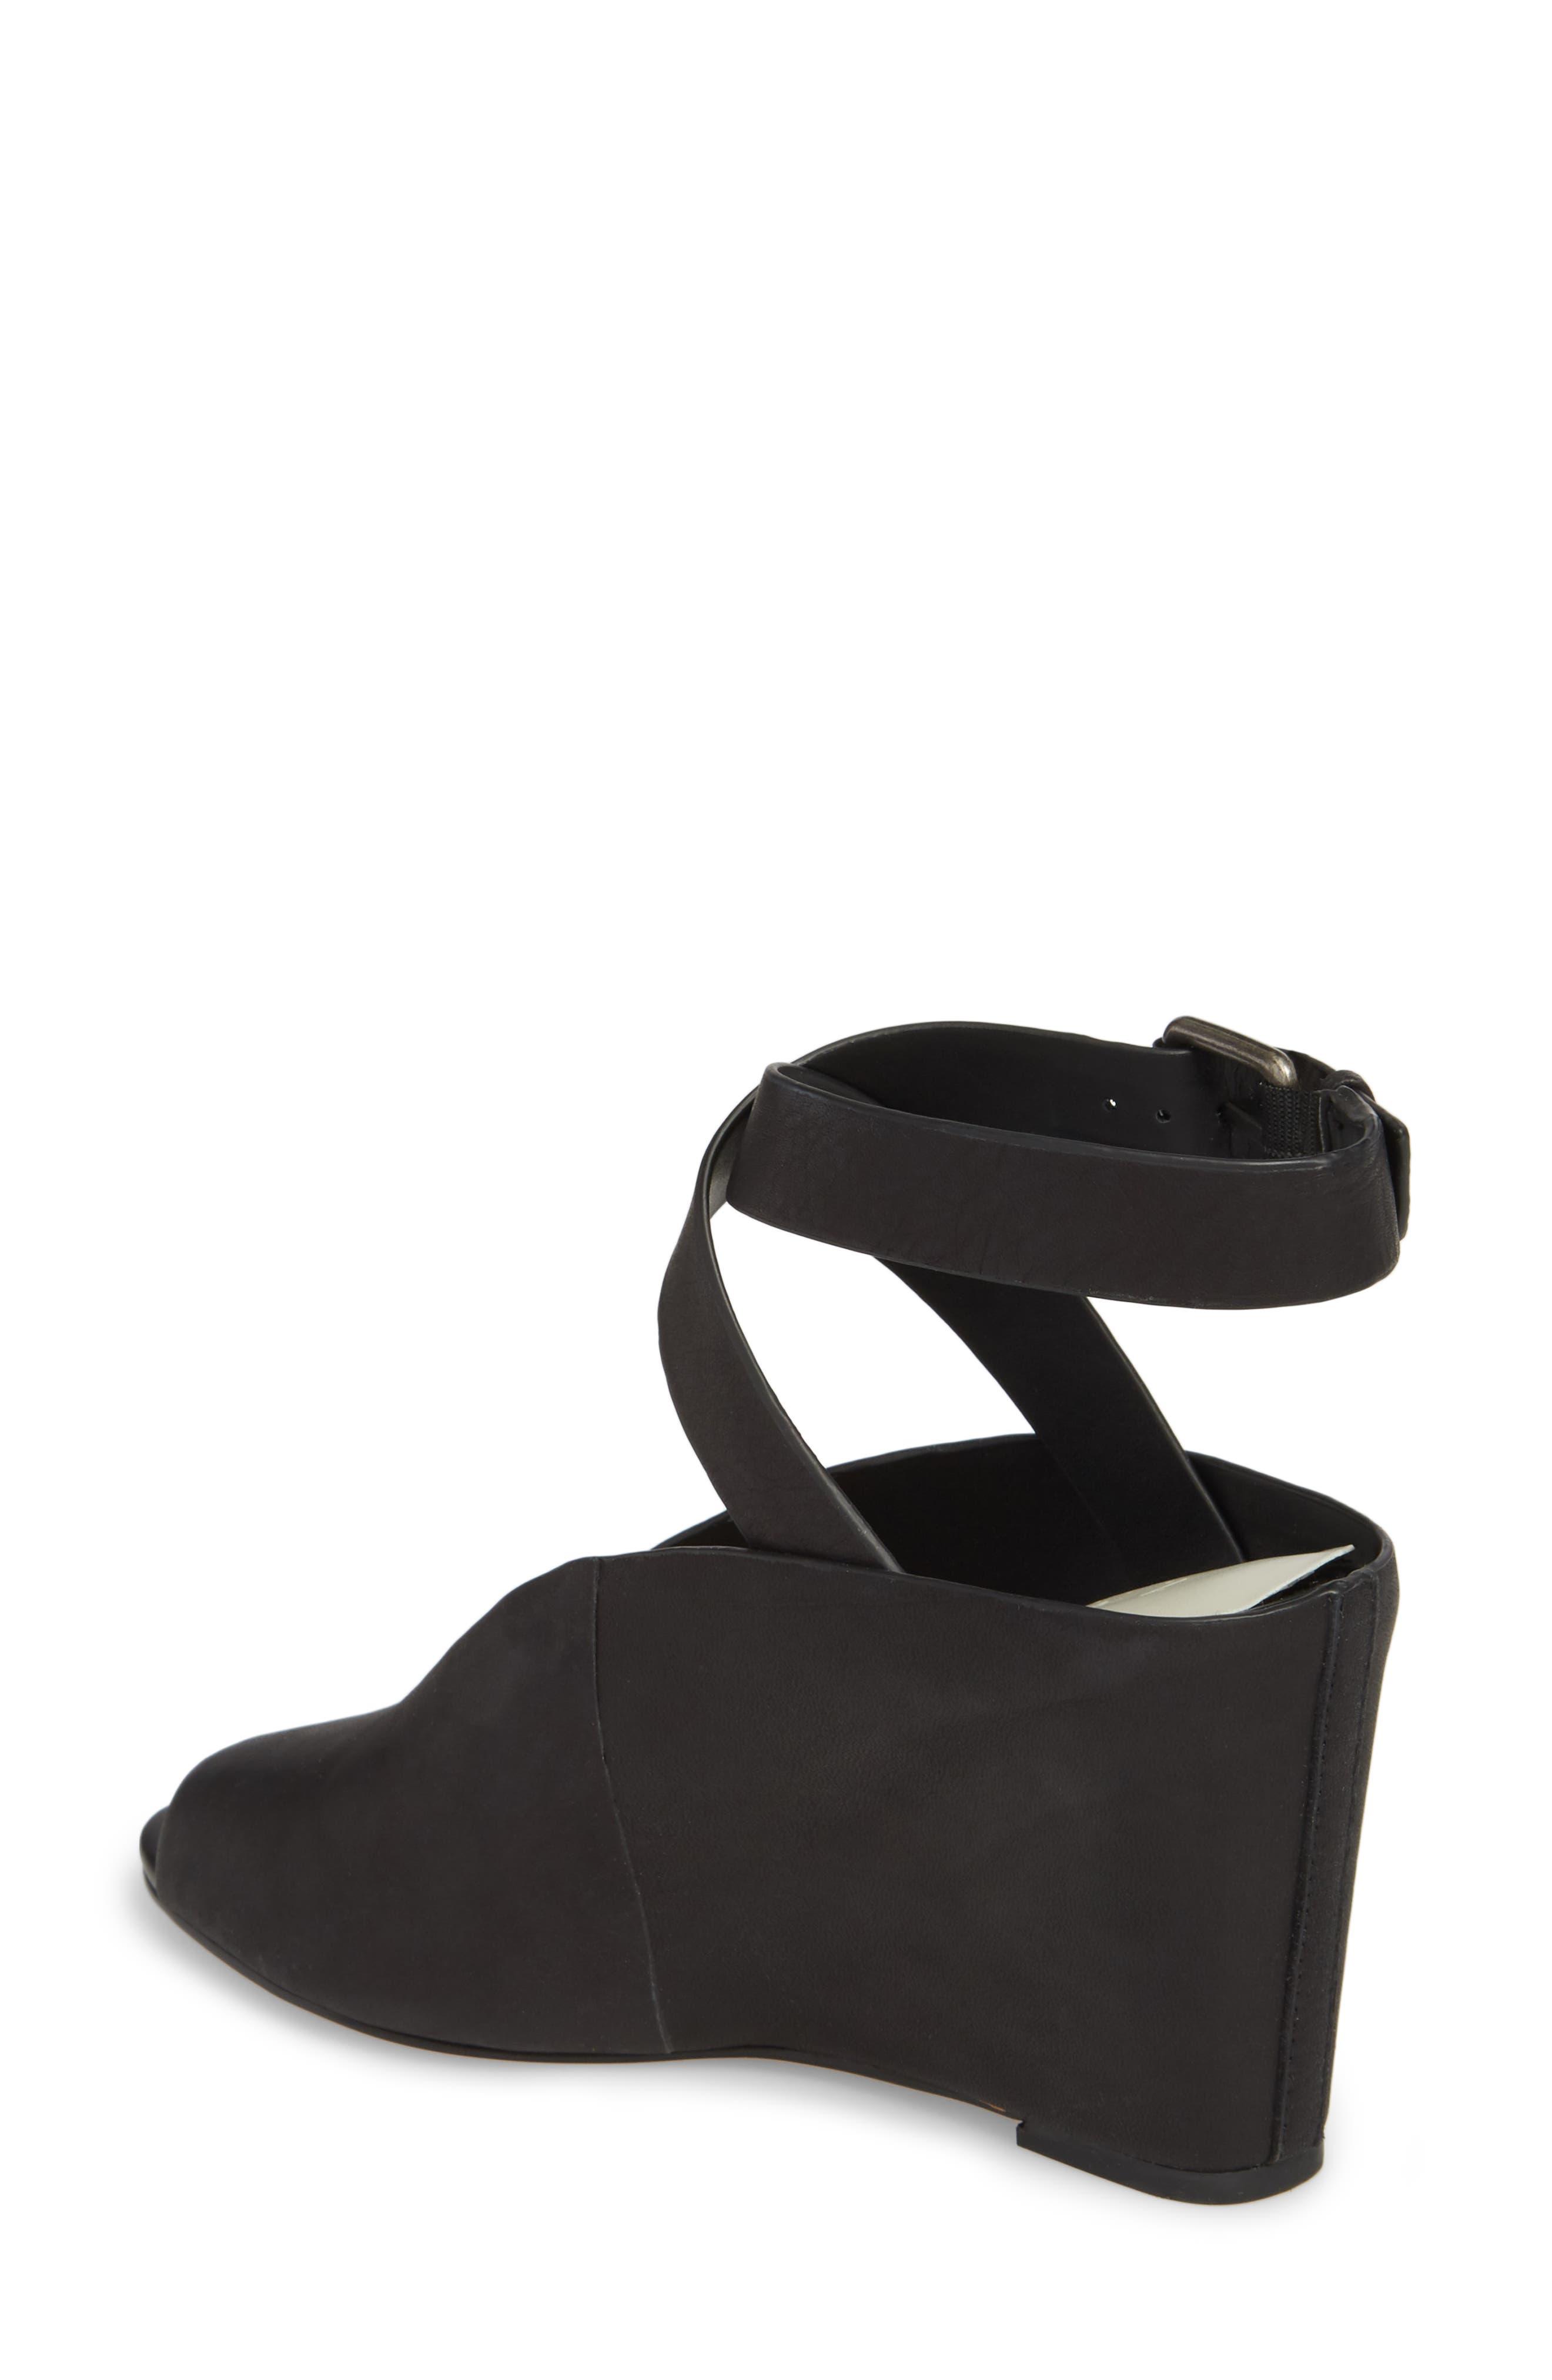 Felidia Wedge Sandal,                             Alternate thumbnail 2, color,                             Black Leather